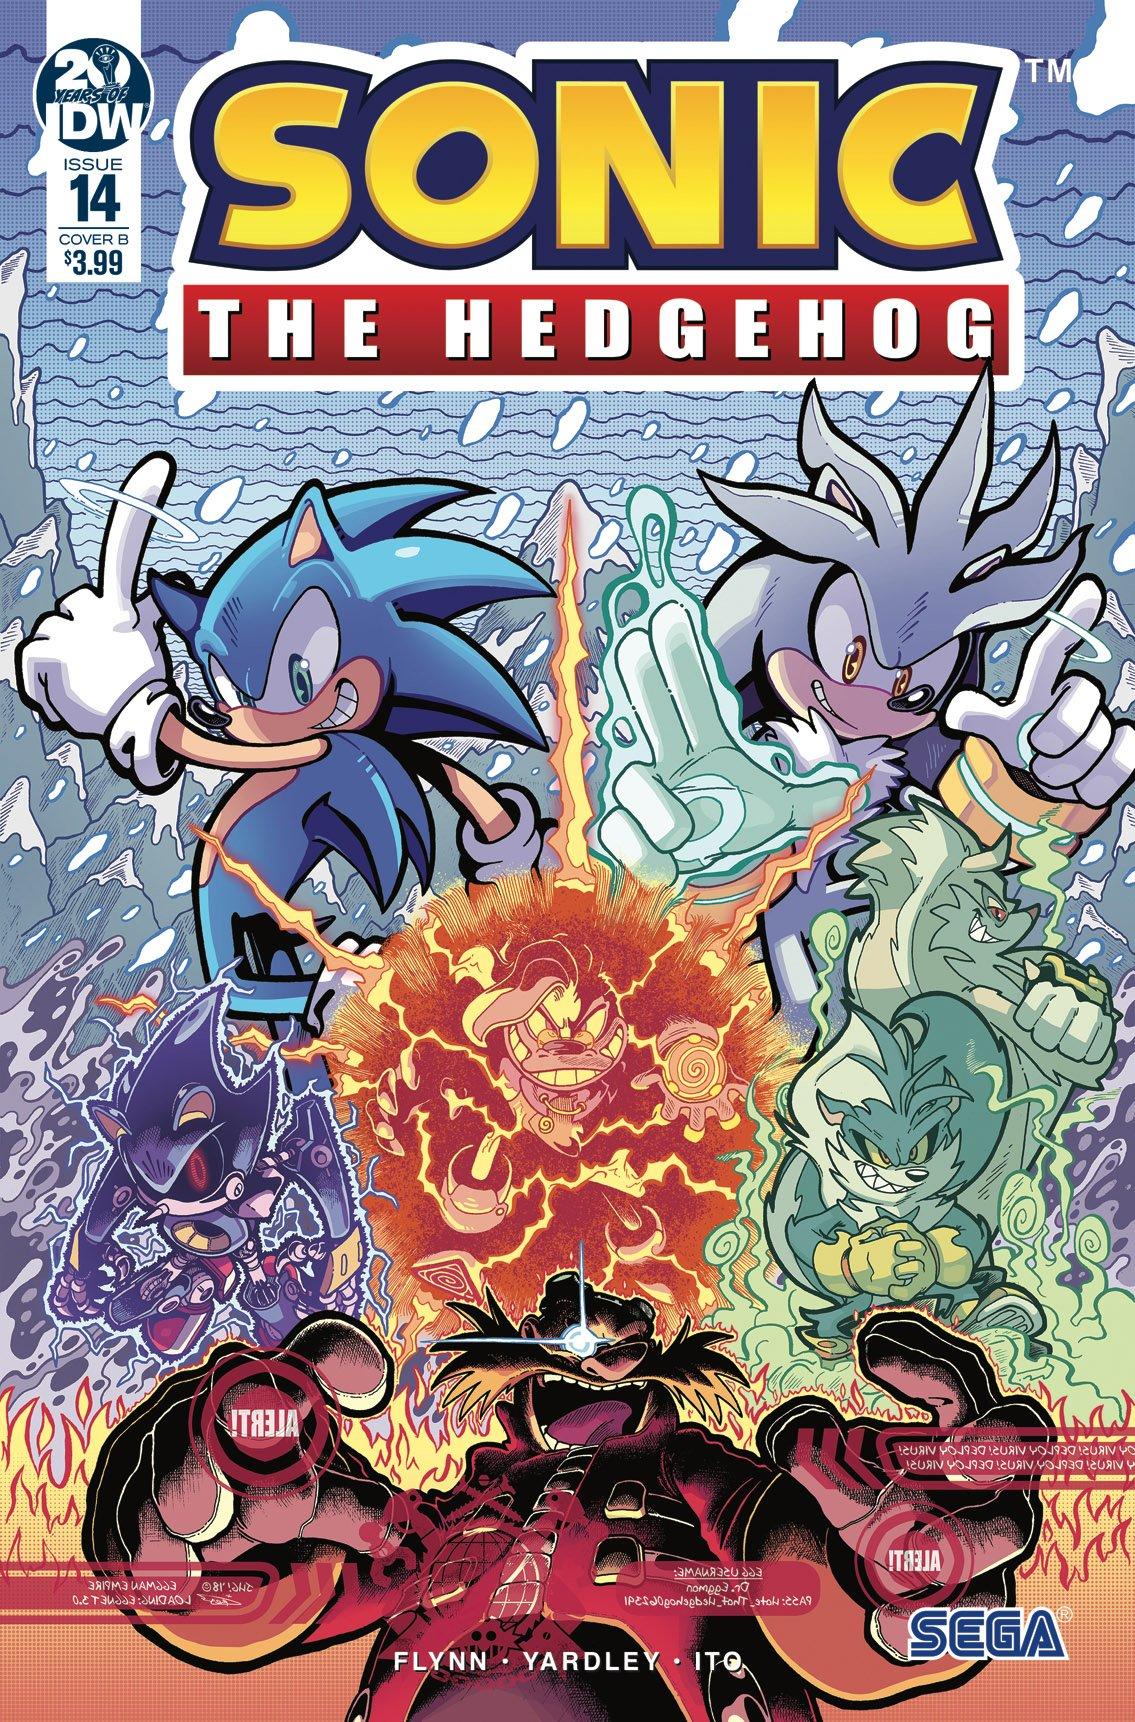 Sonic the Hedgehog 014 (February 2019) (cover b)